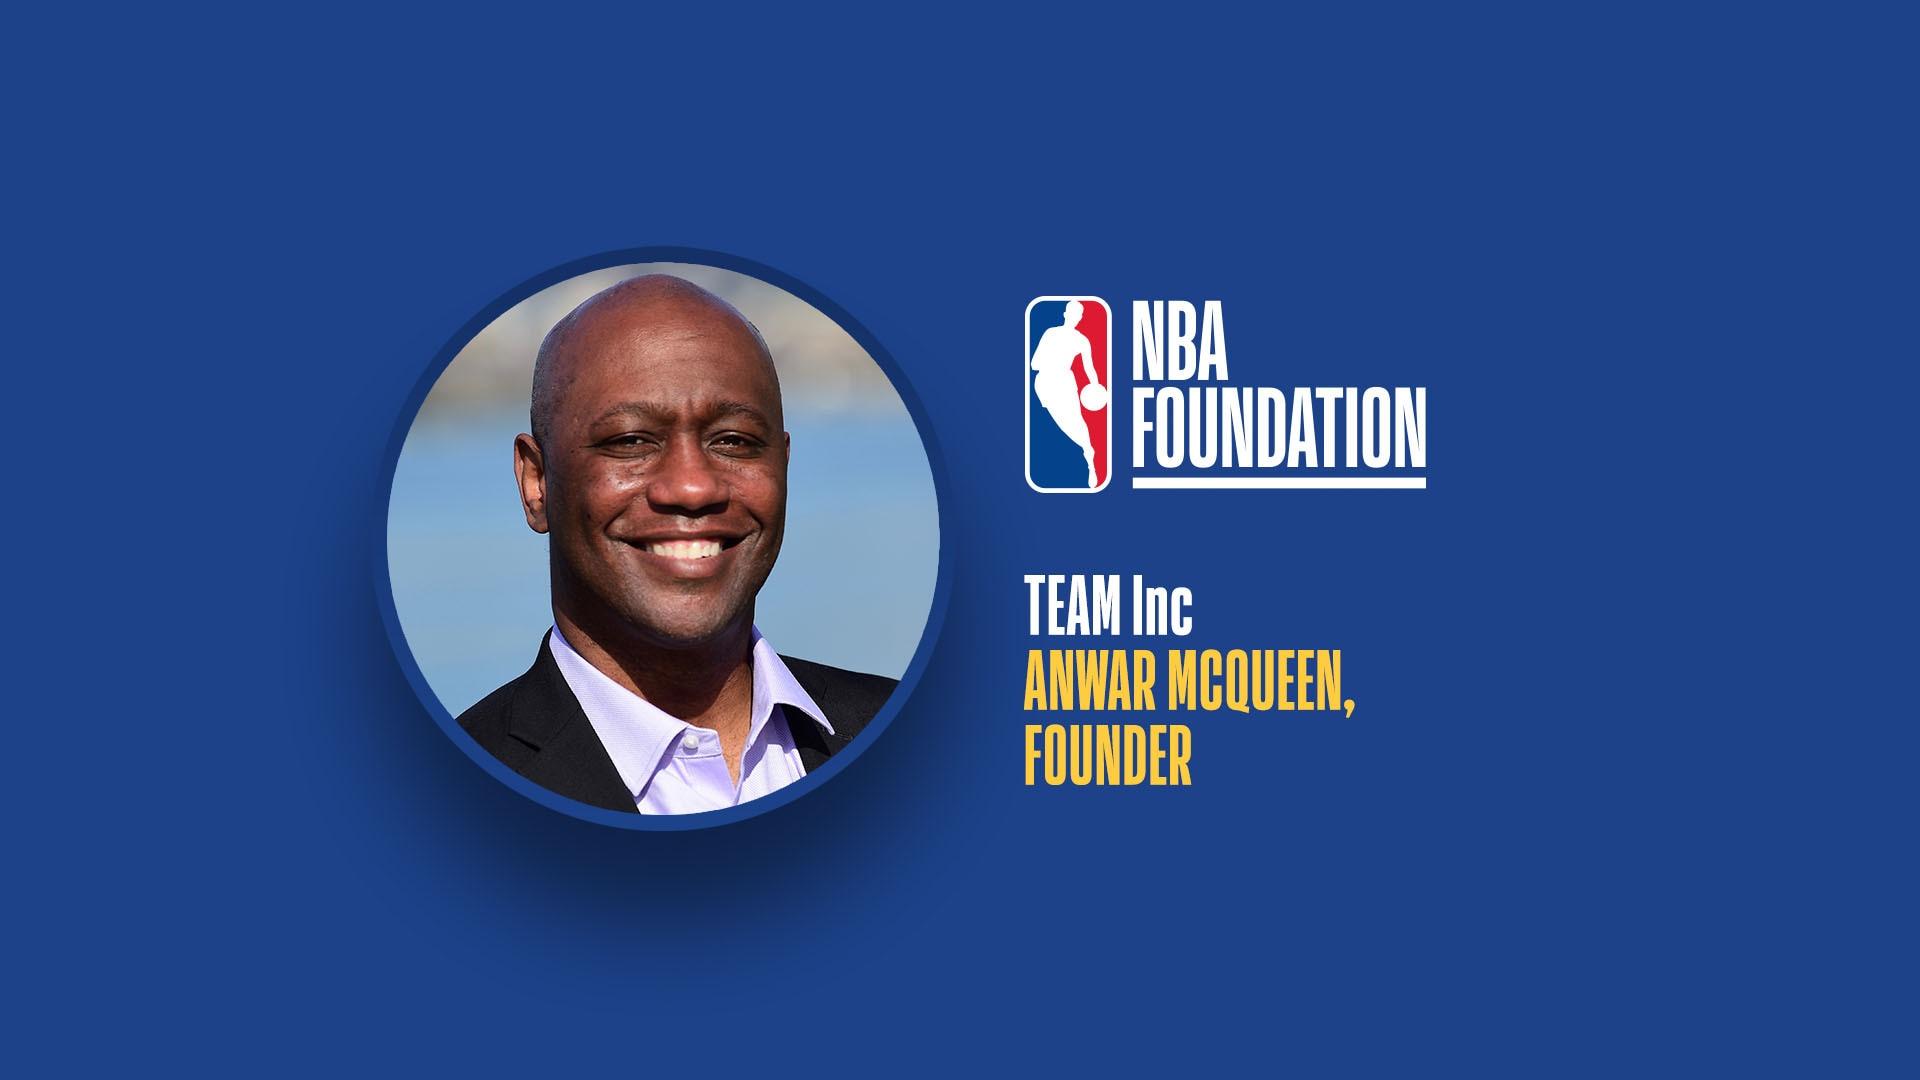 NBA Foundation grantee spotlight: TEAM Inc